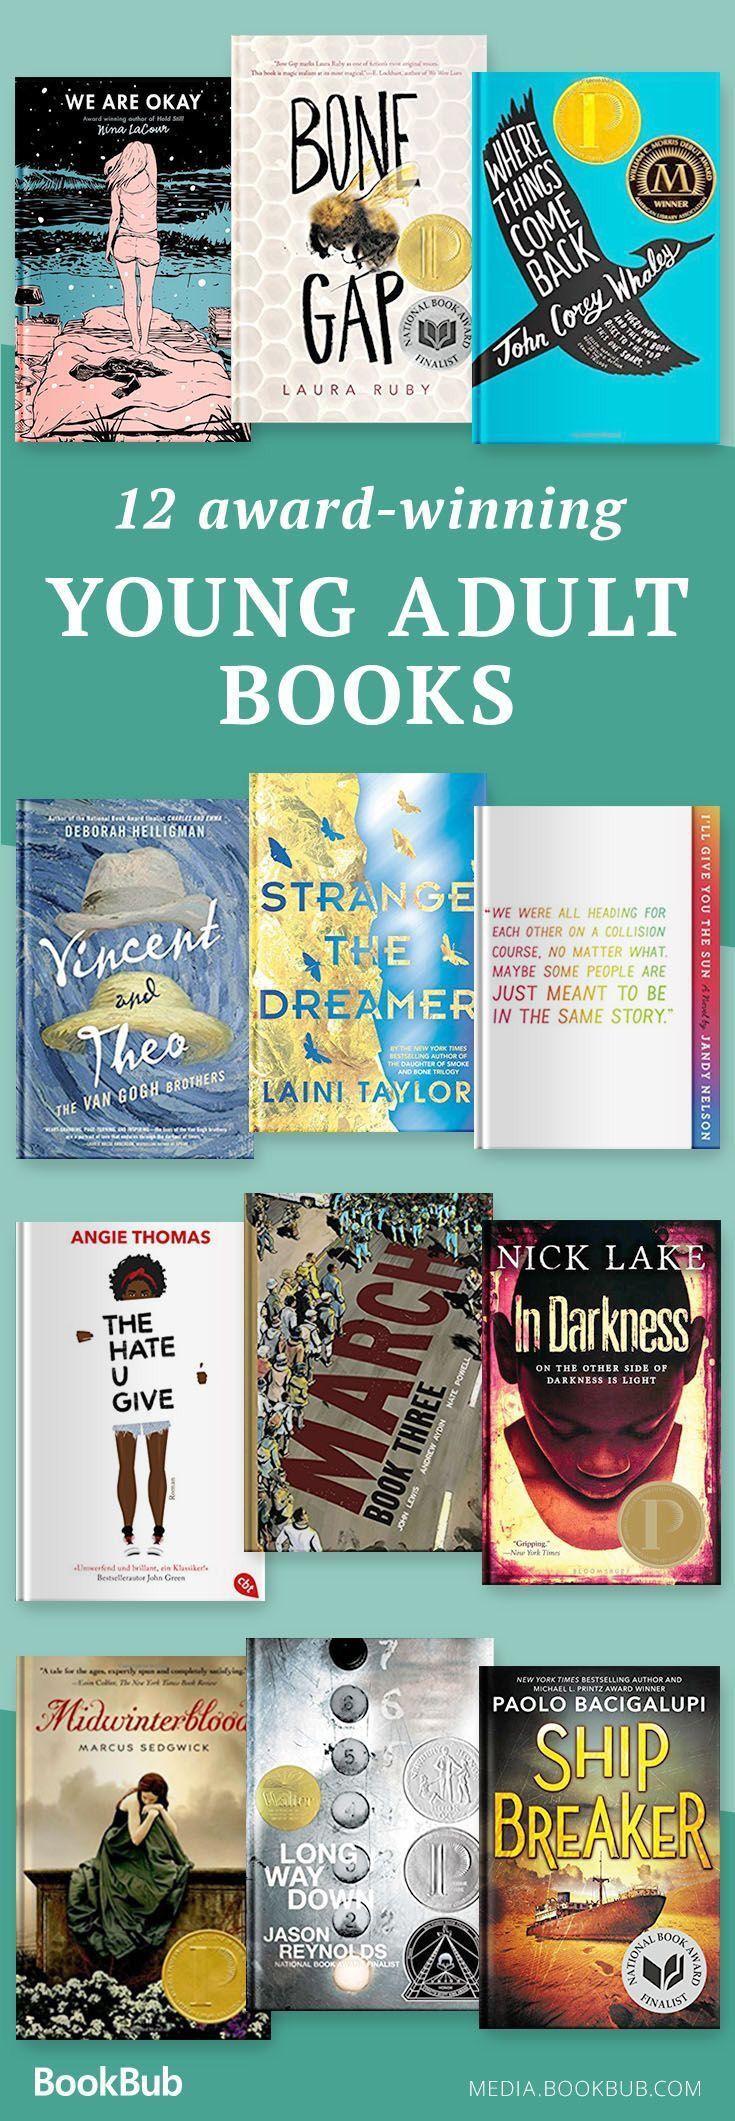 Bookworm Booksss En 2019 Livre Ado Livres De Fiction